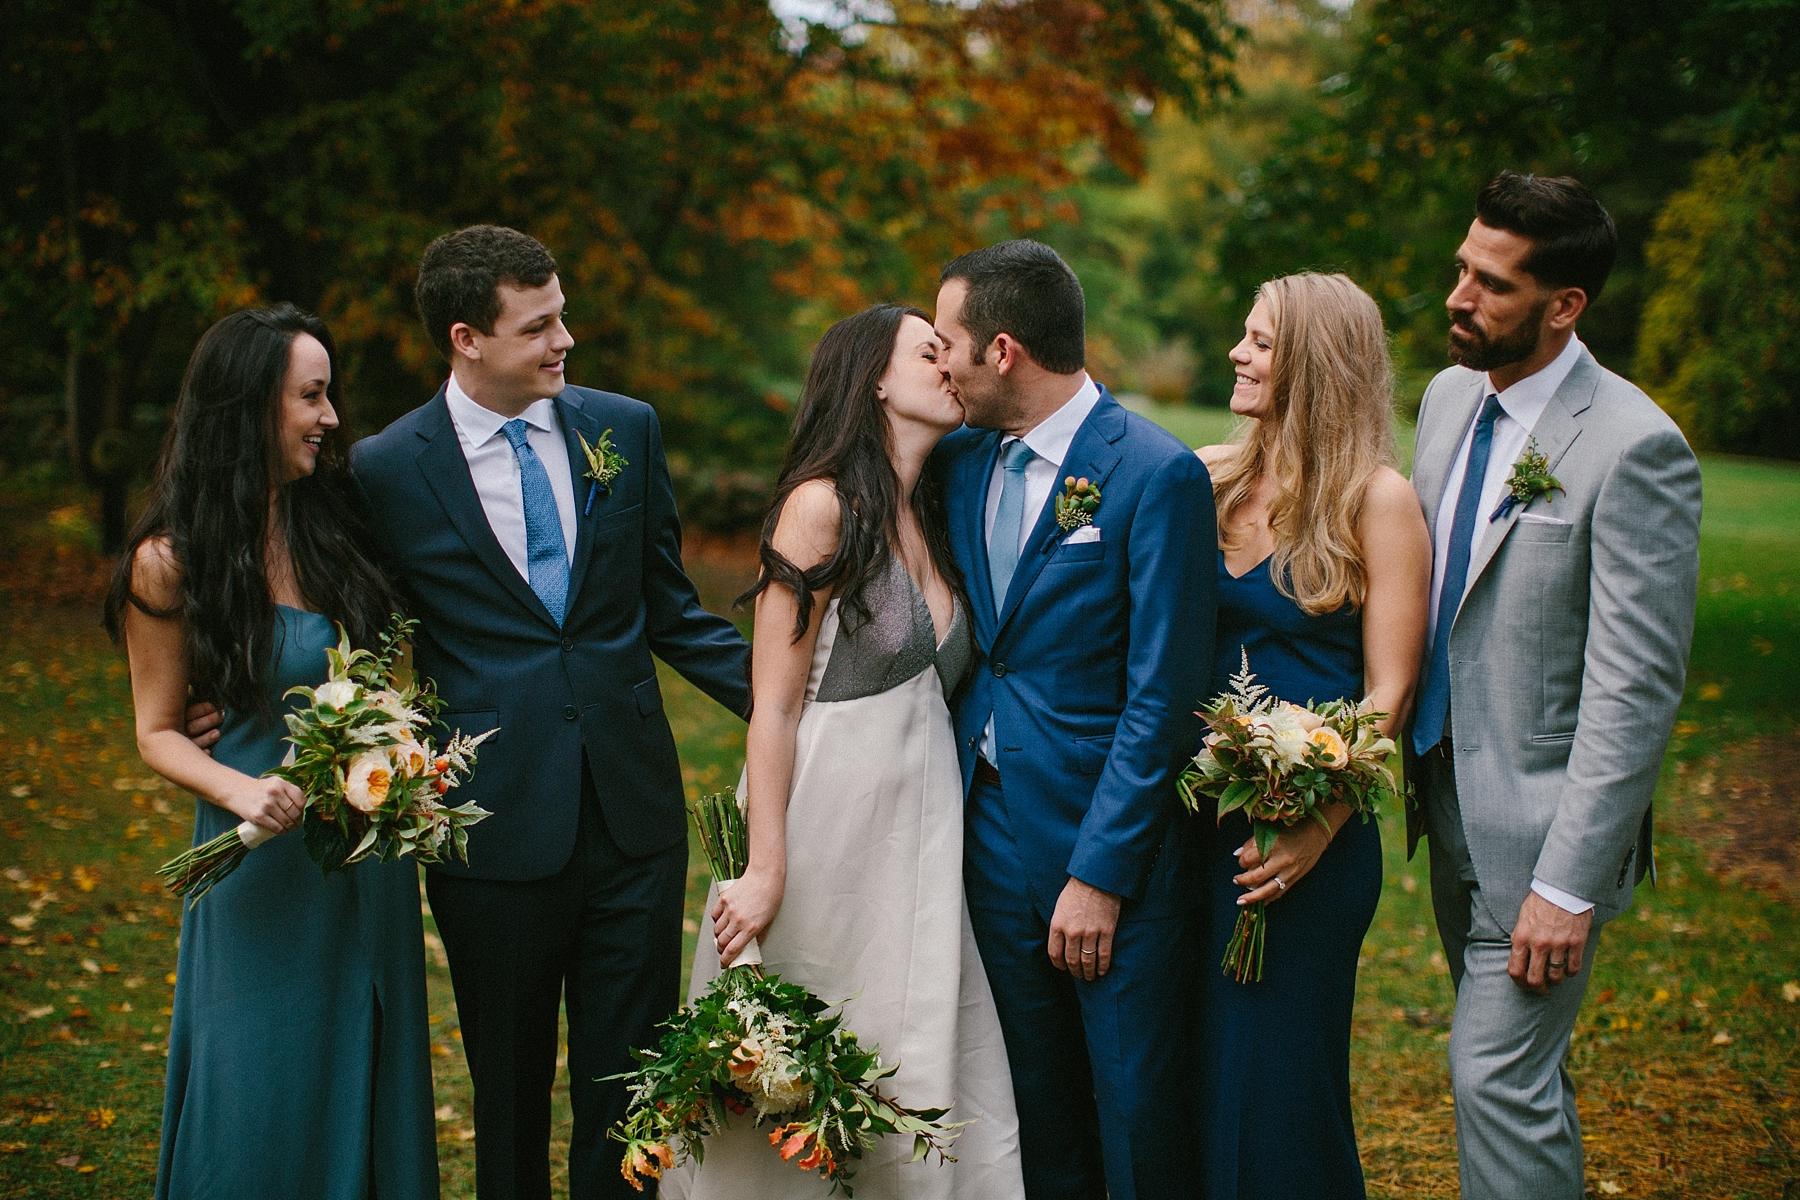 intimate-destination-wedding-photographer-outdoor_0139.jpg